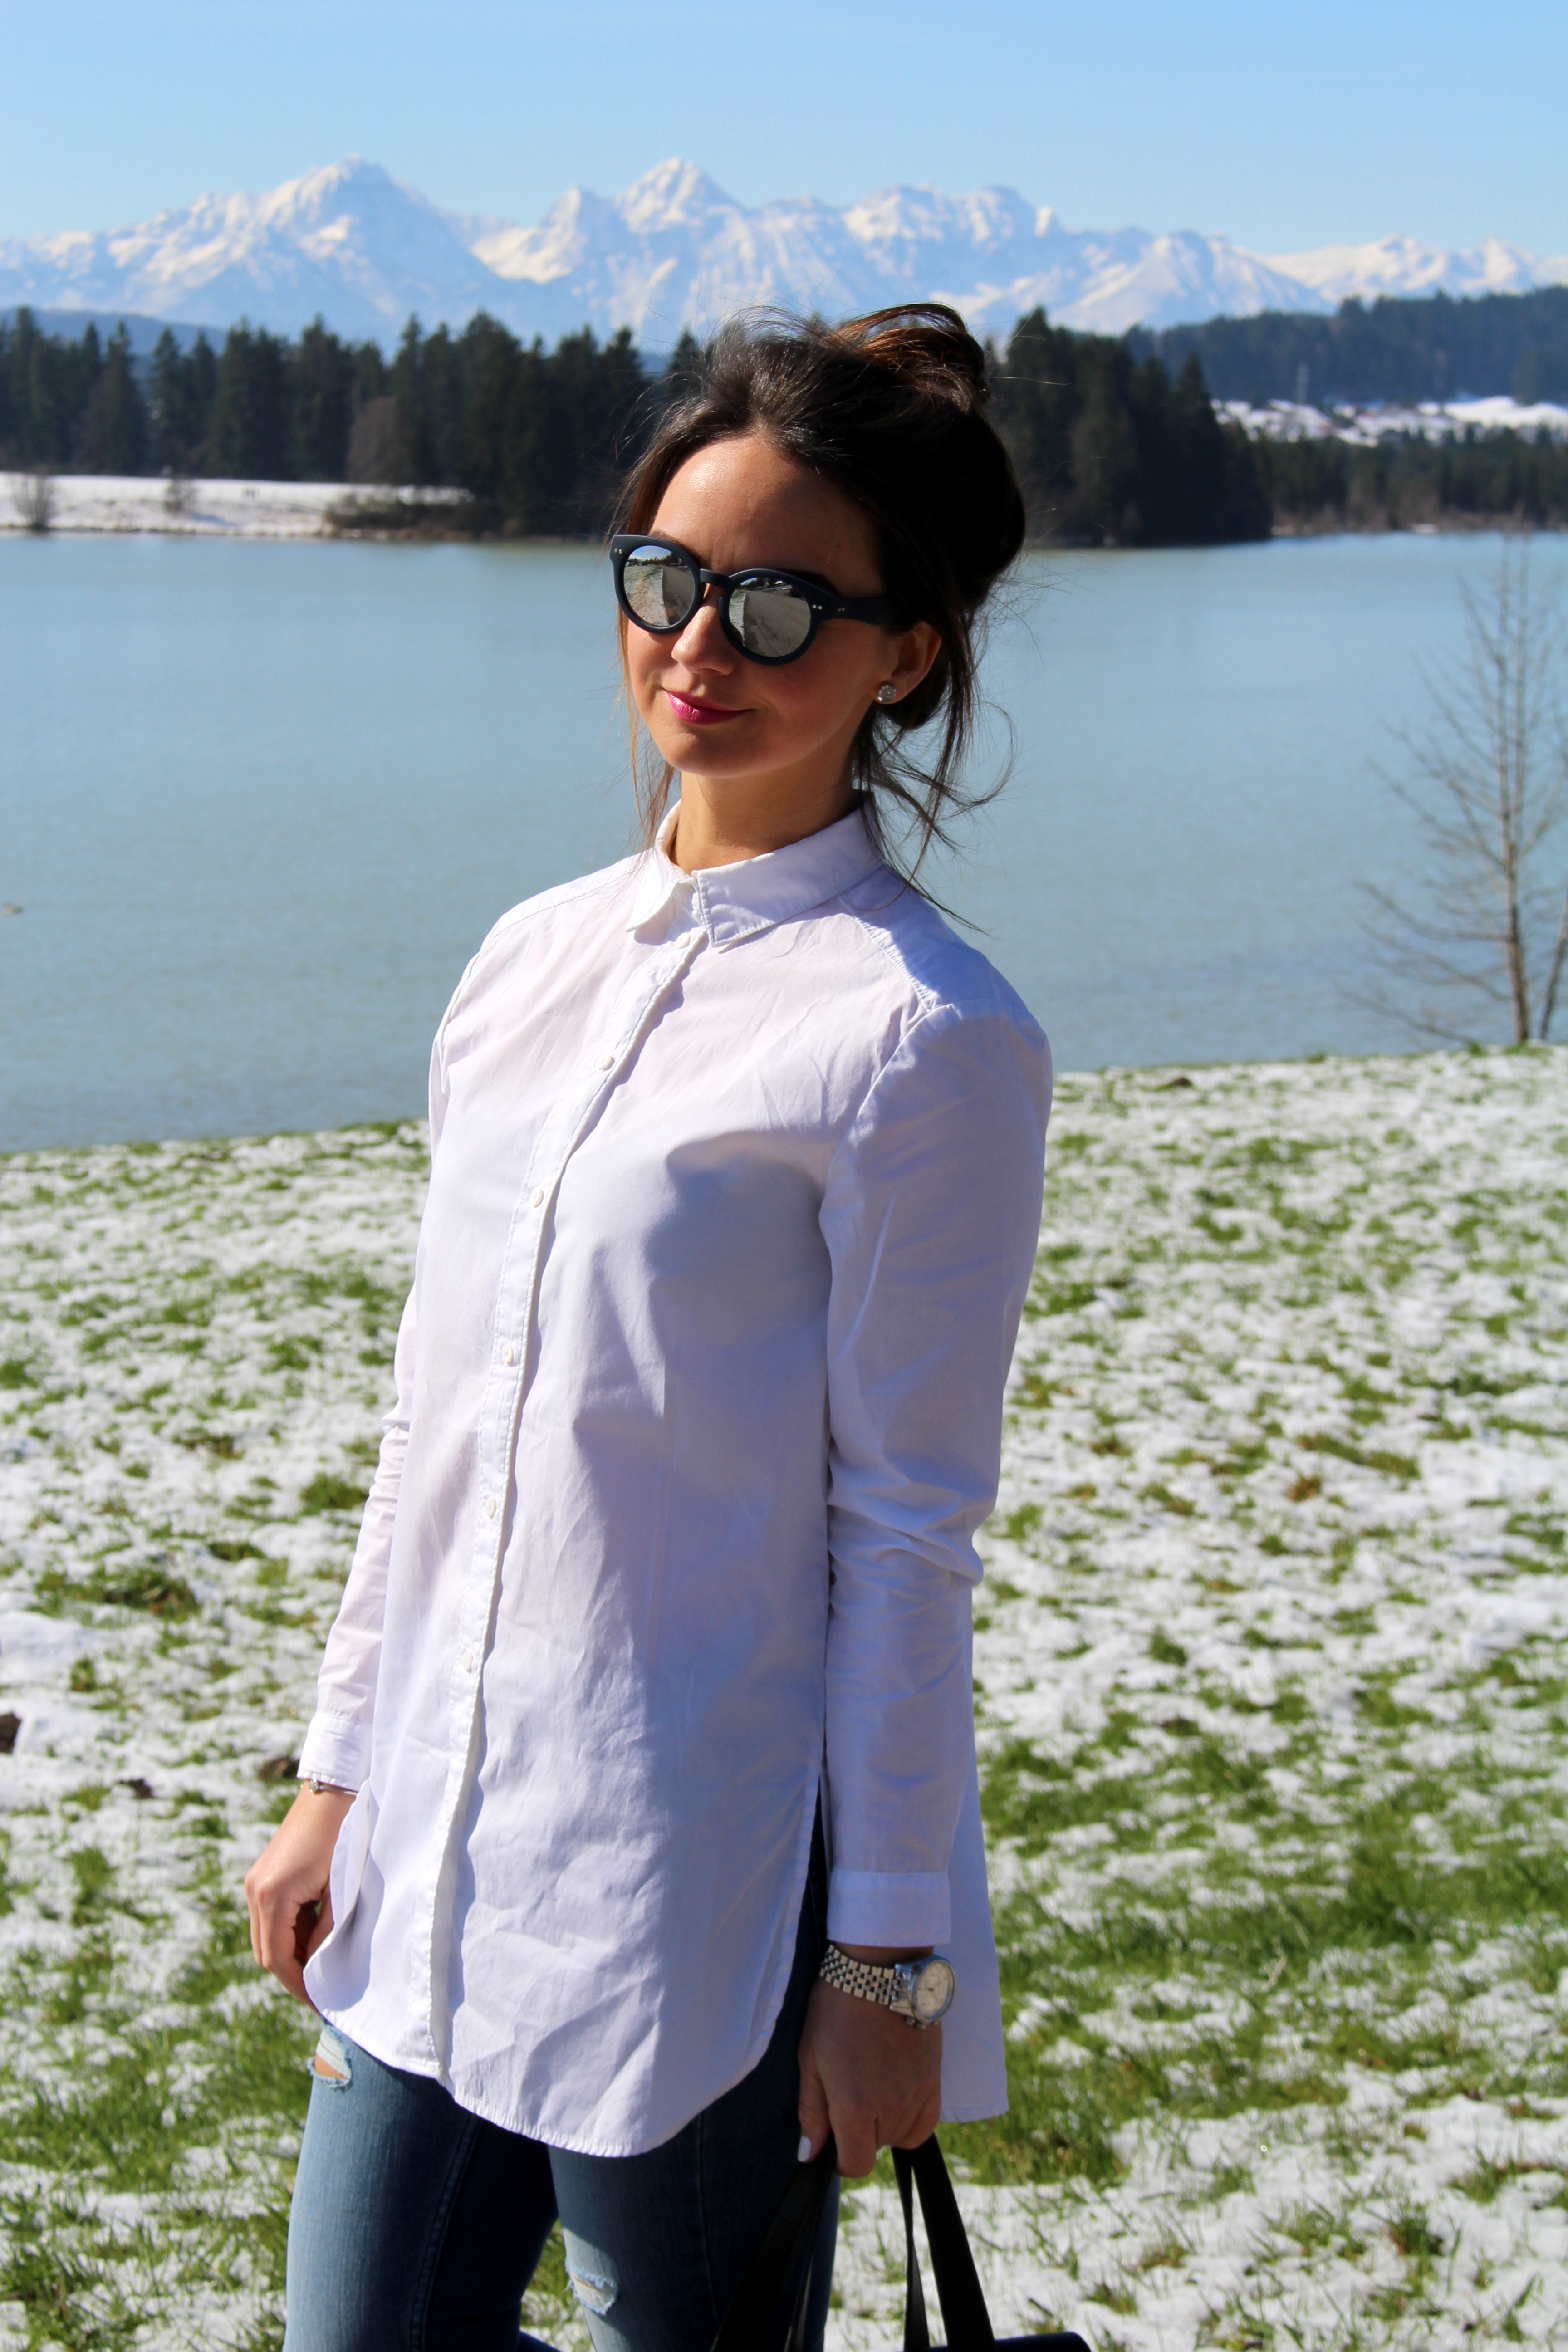 Fashioncircuz by Jenny img_4693 Adidas Stan Smith! Meine perfekten Begleiter für jeden Trip!